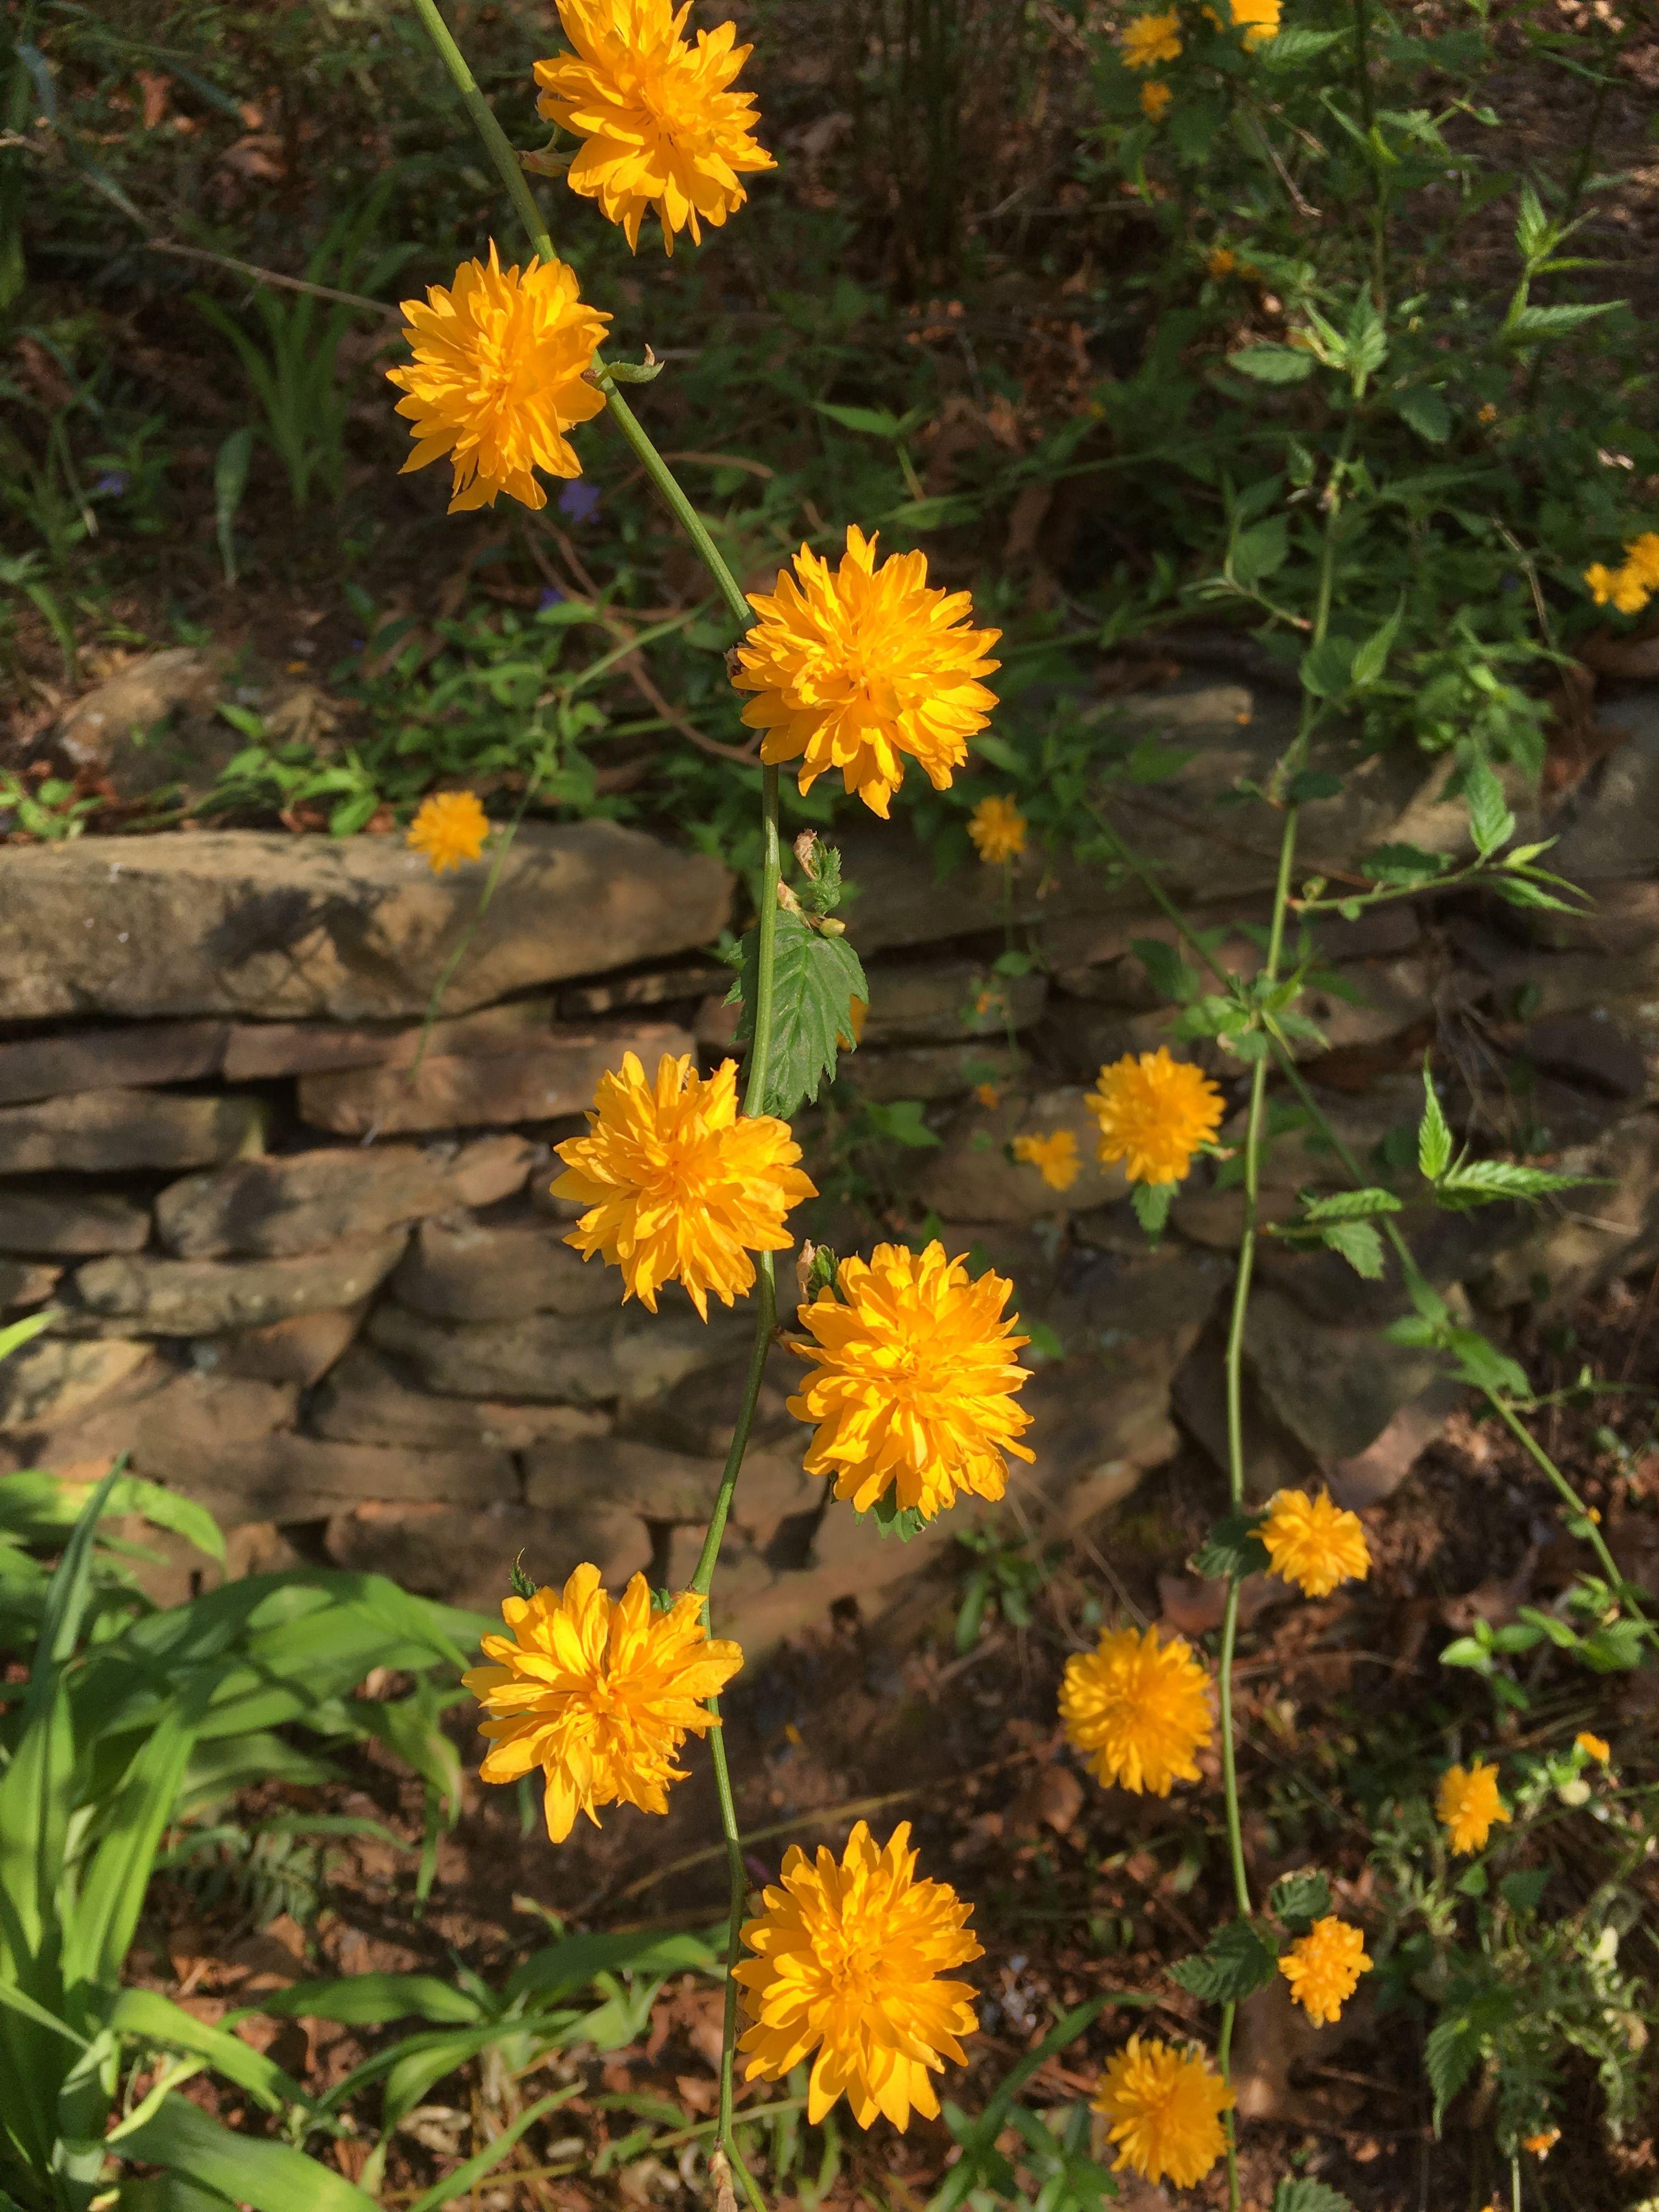 Kerria Japonica Pleniflora | Herbarij - Lesnate rastline | Pinterest ...